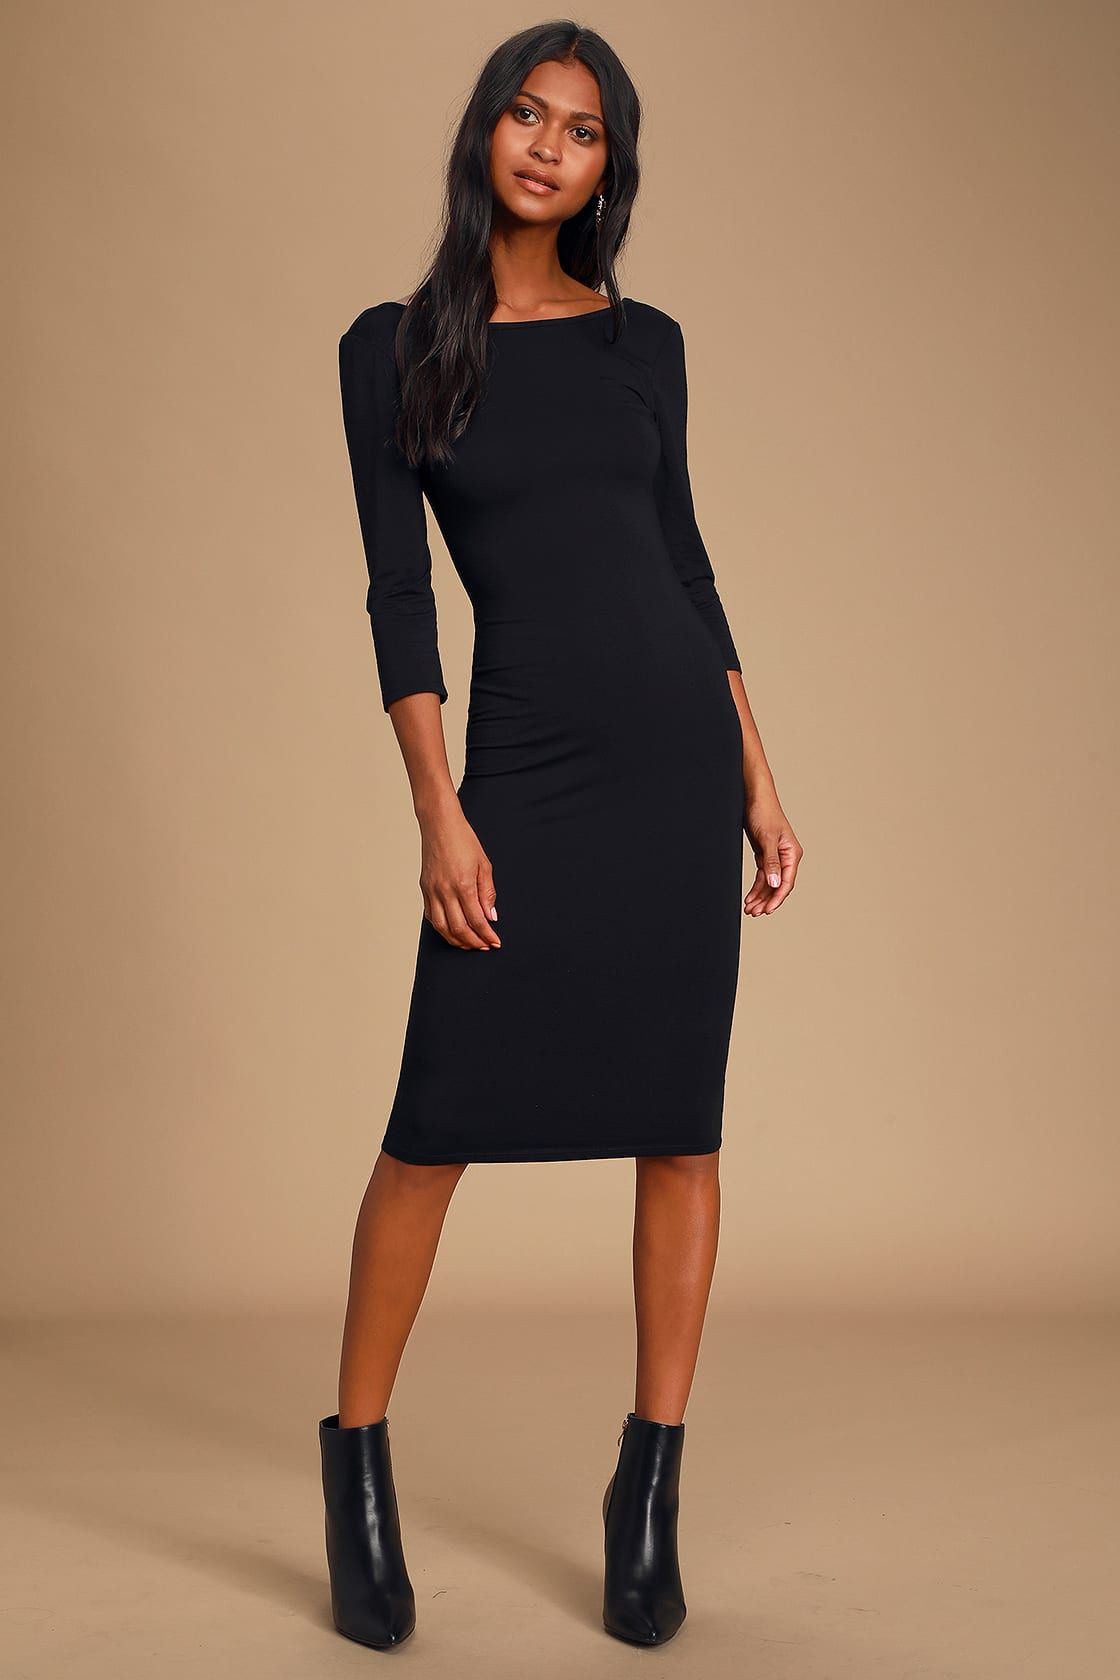 True To You Black Midi Dress In 2021 Midi Dress Casual Long Sleeve Dresses Fall Chic Black Dress [ 1680 x 1120 Pixel ]